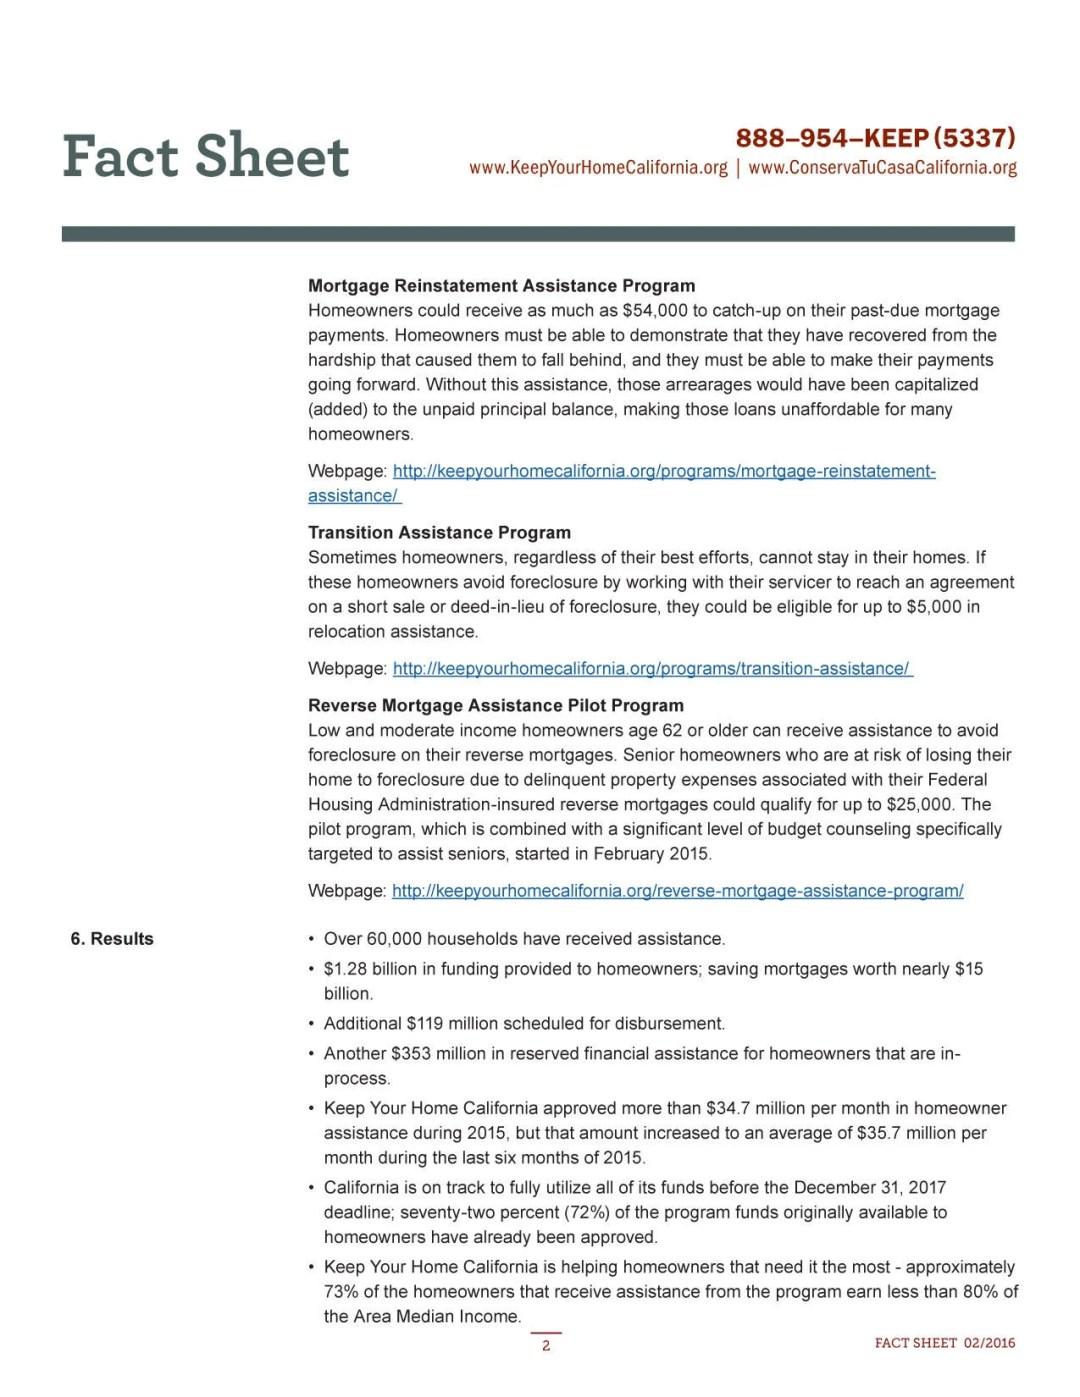 Fact-Sheet-2